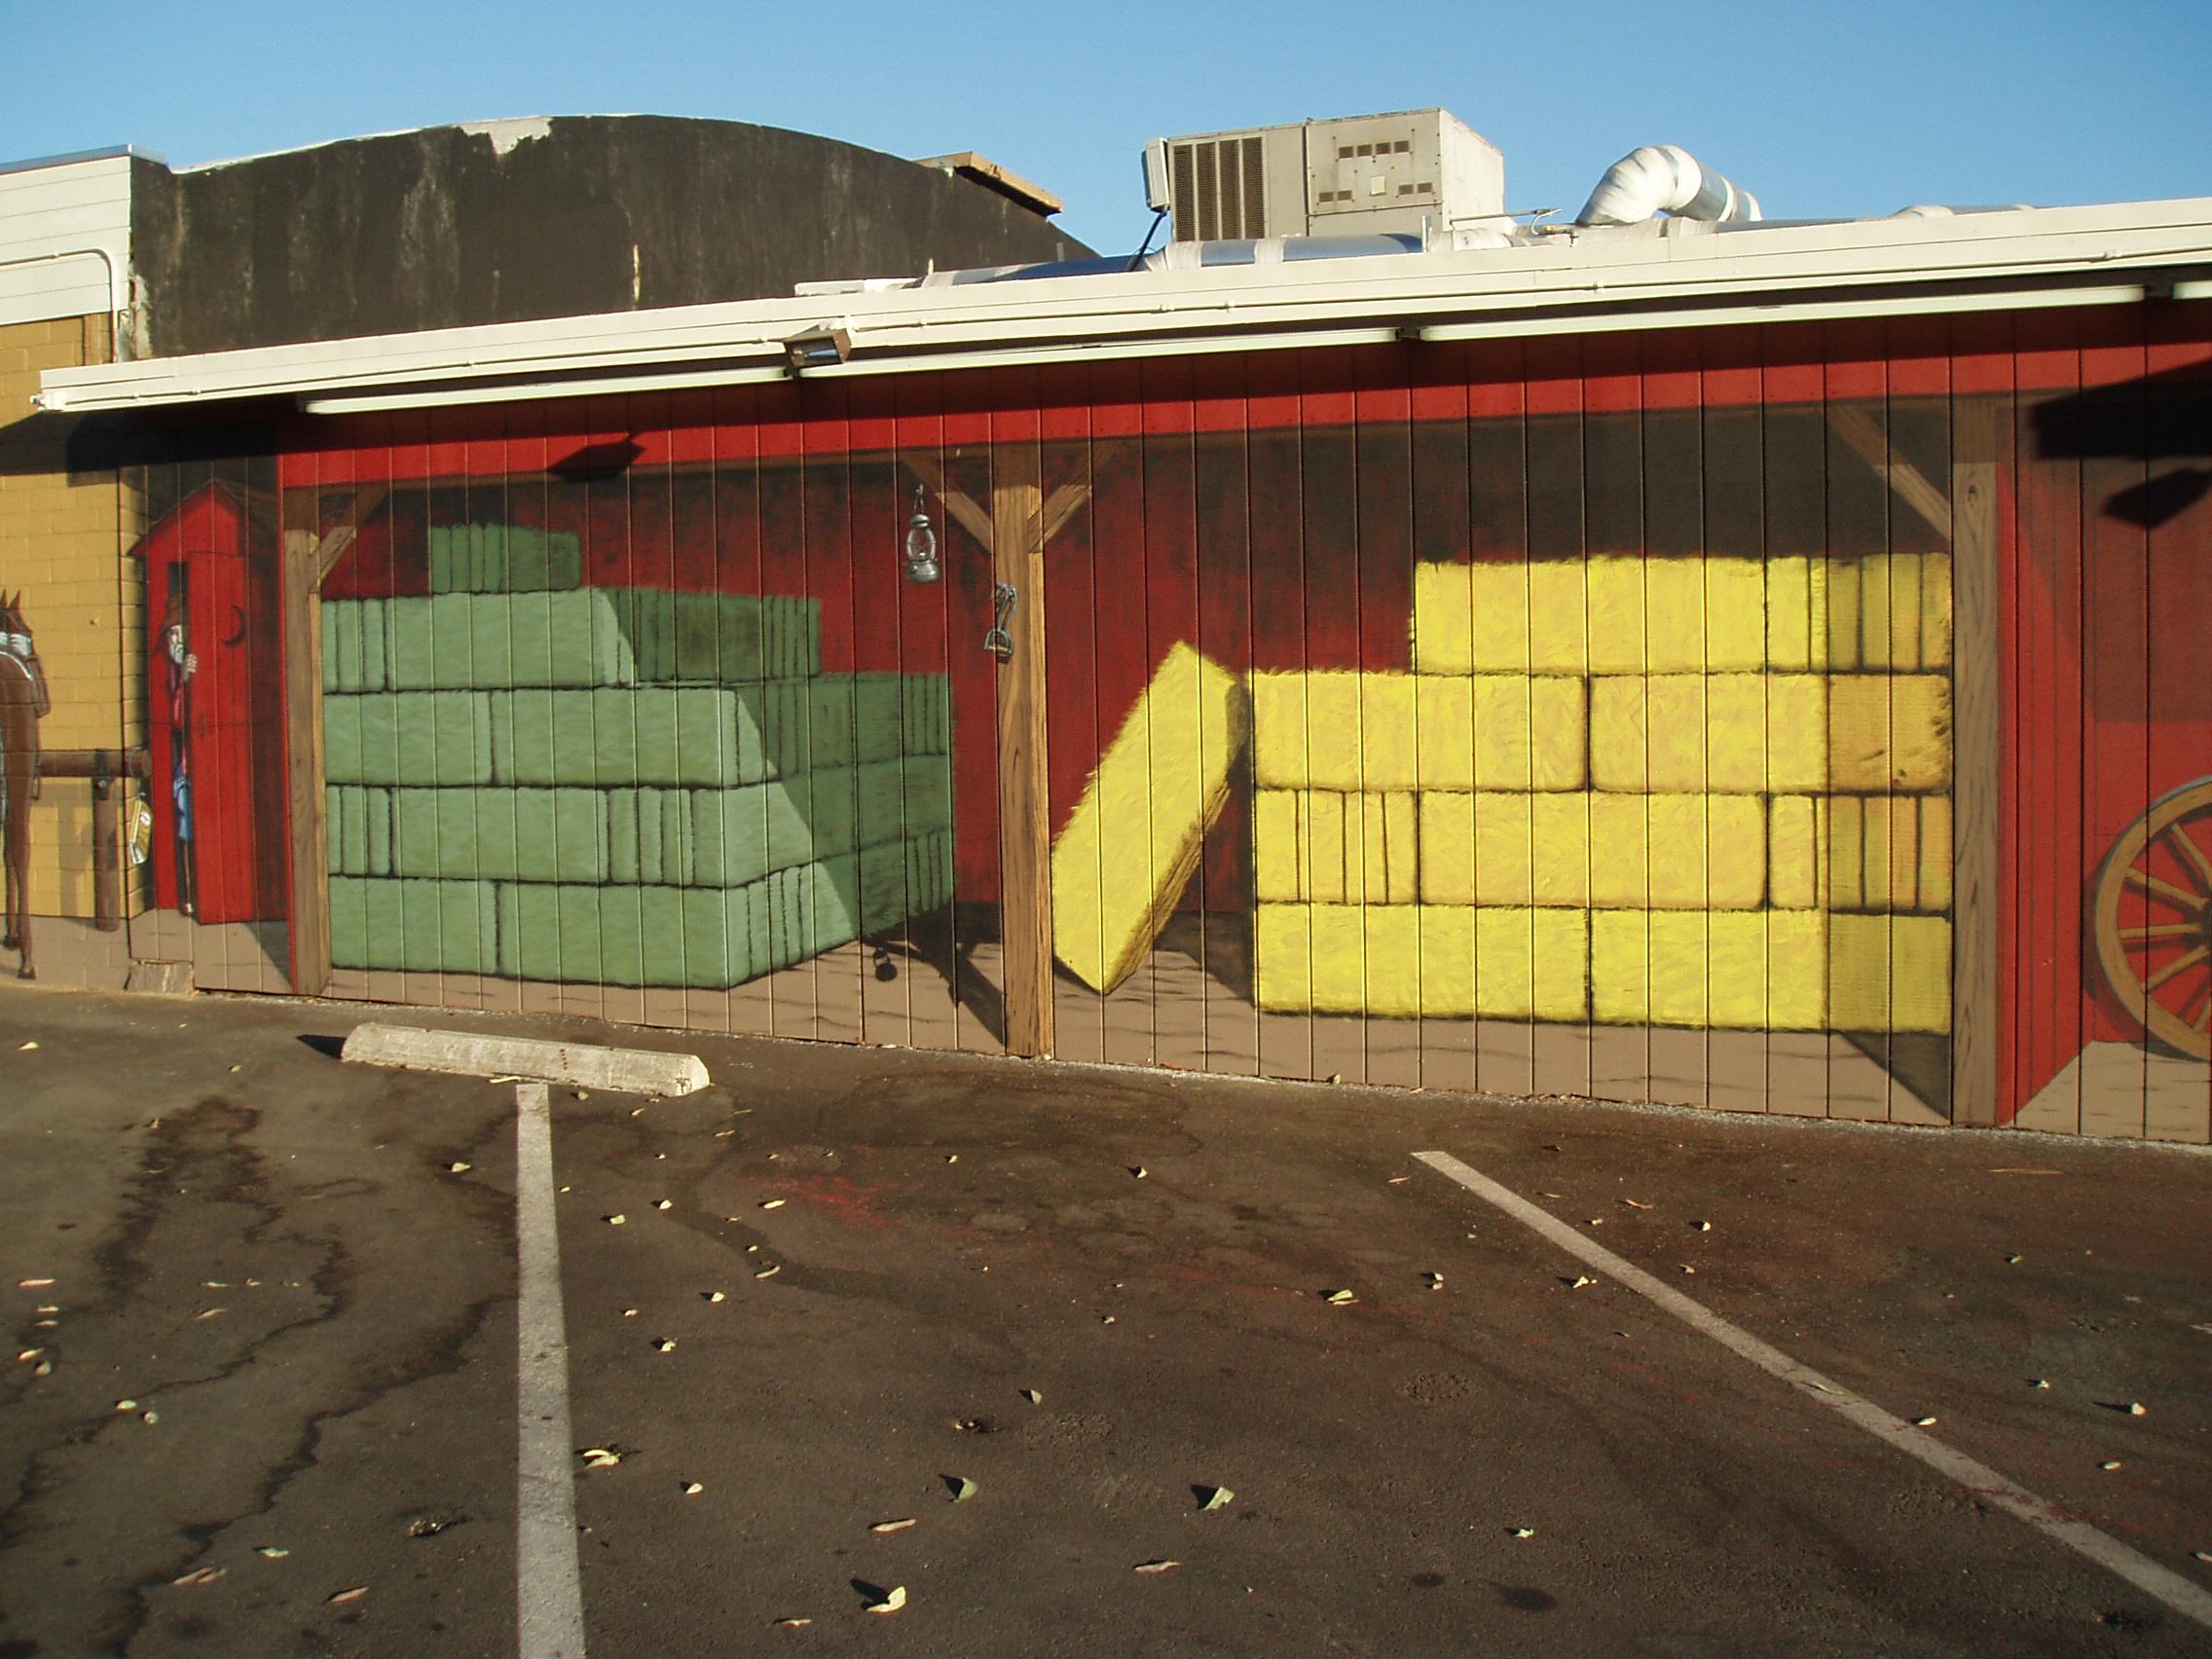 Western Mural Wagon Wheel Restaurant exterior Santee California 15.jpg